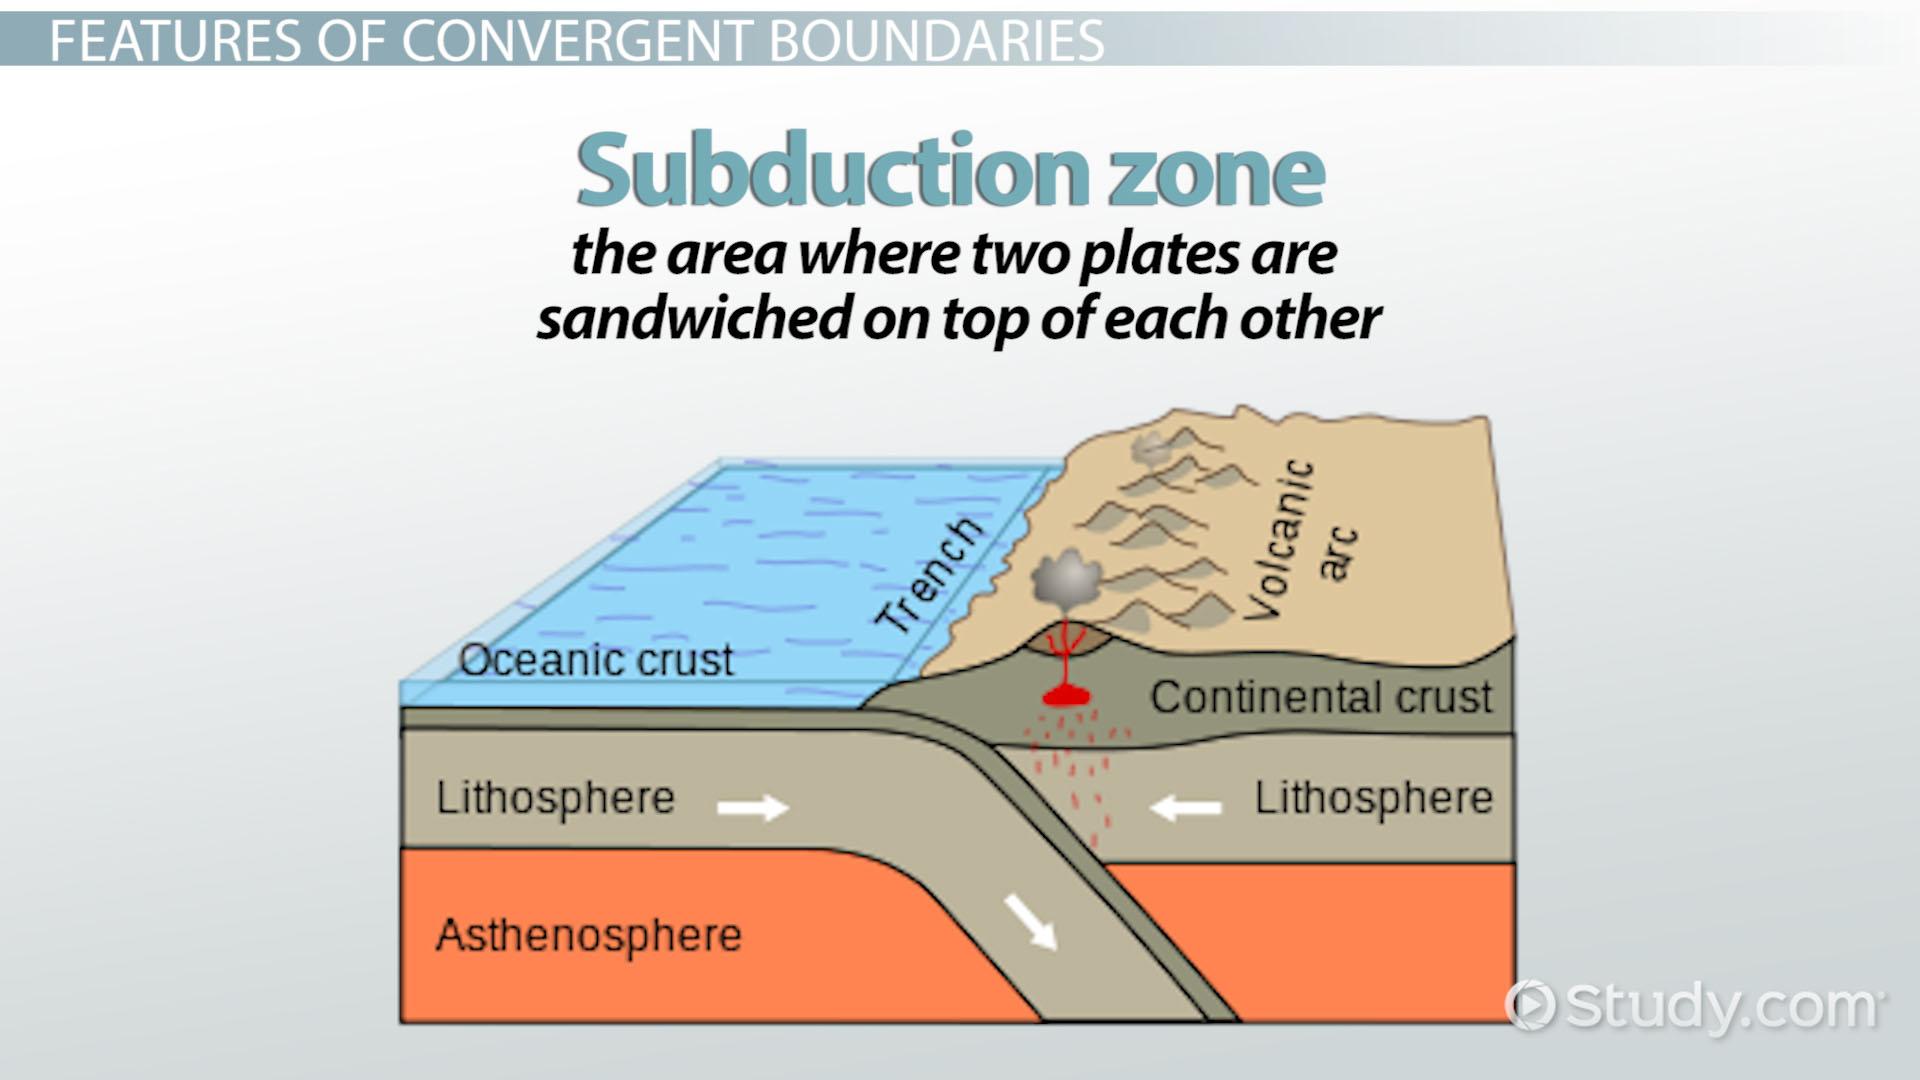 What does ocean floor being subducted mean meze blog for Ocean floor features definition